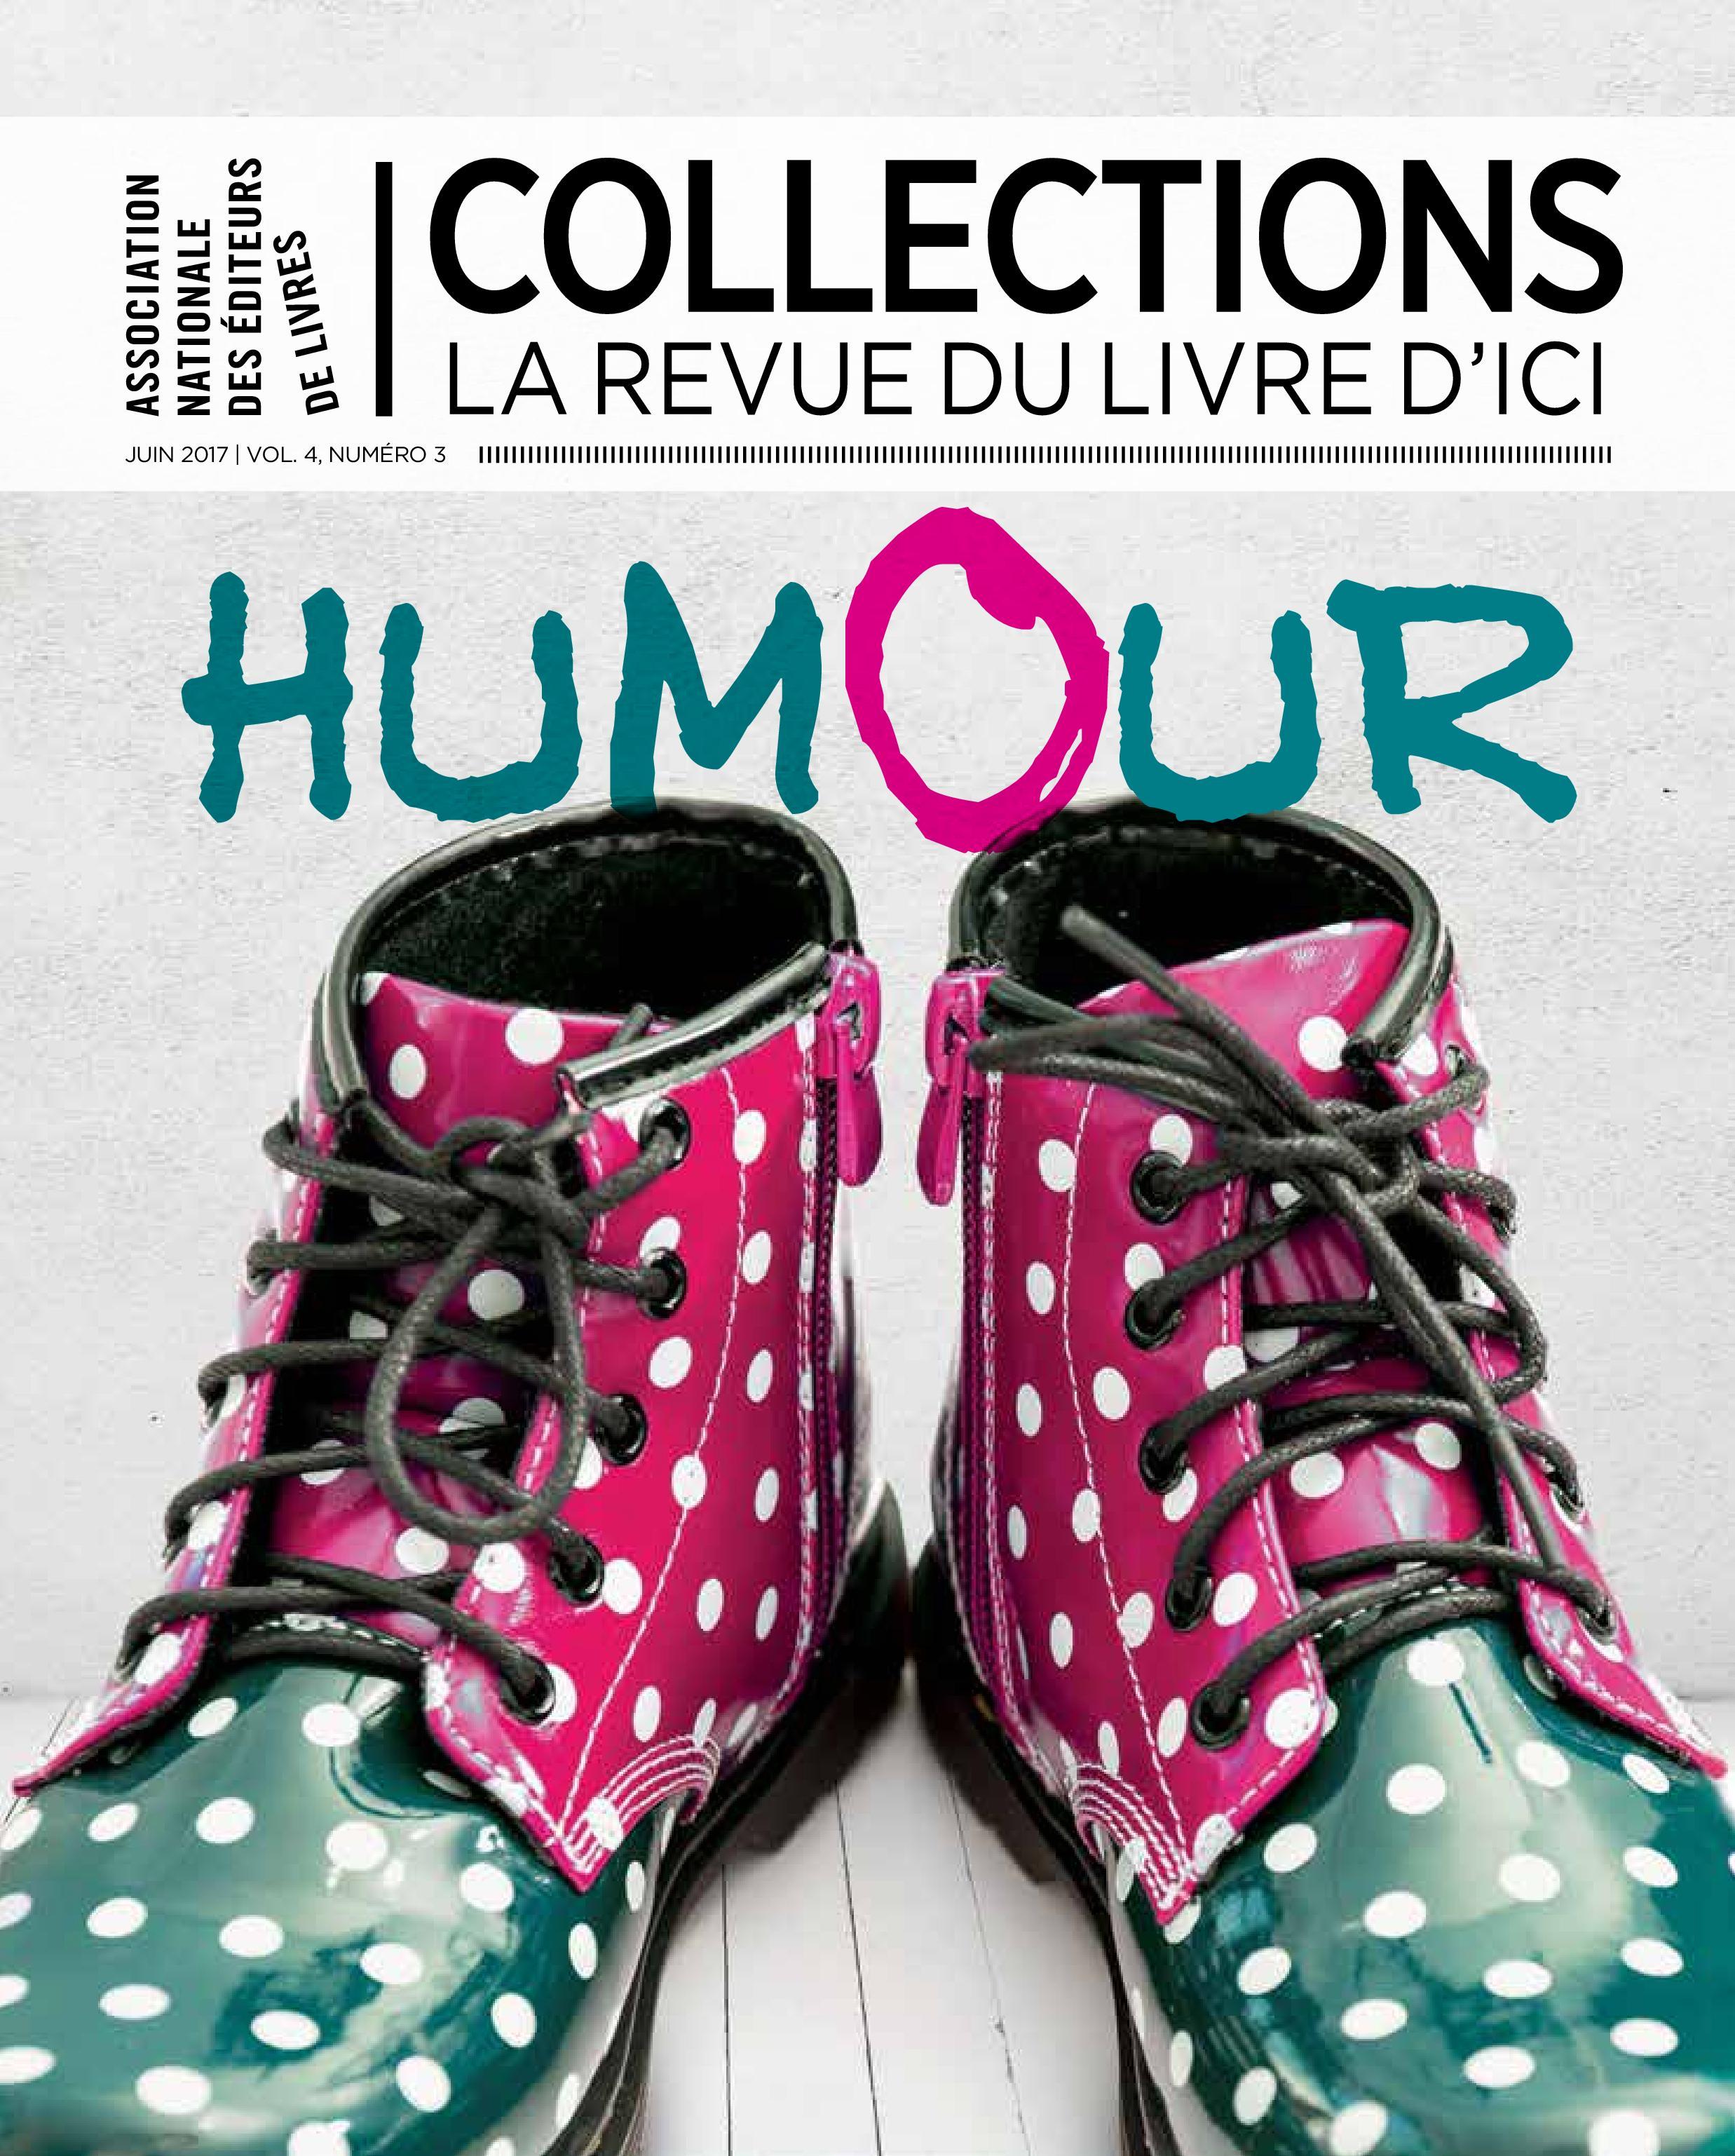 Collections Vol 4, No 3, Hu...